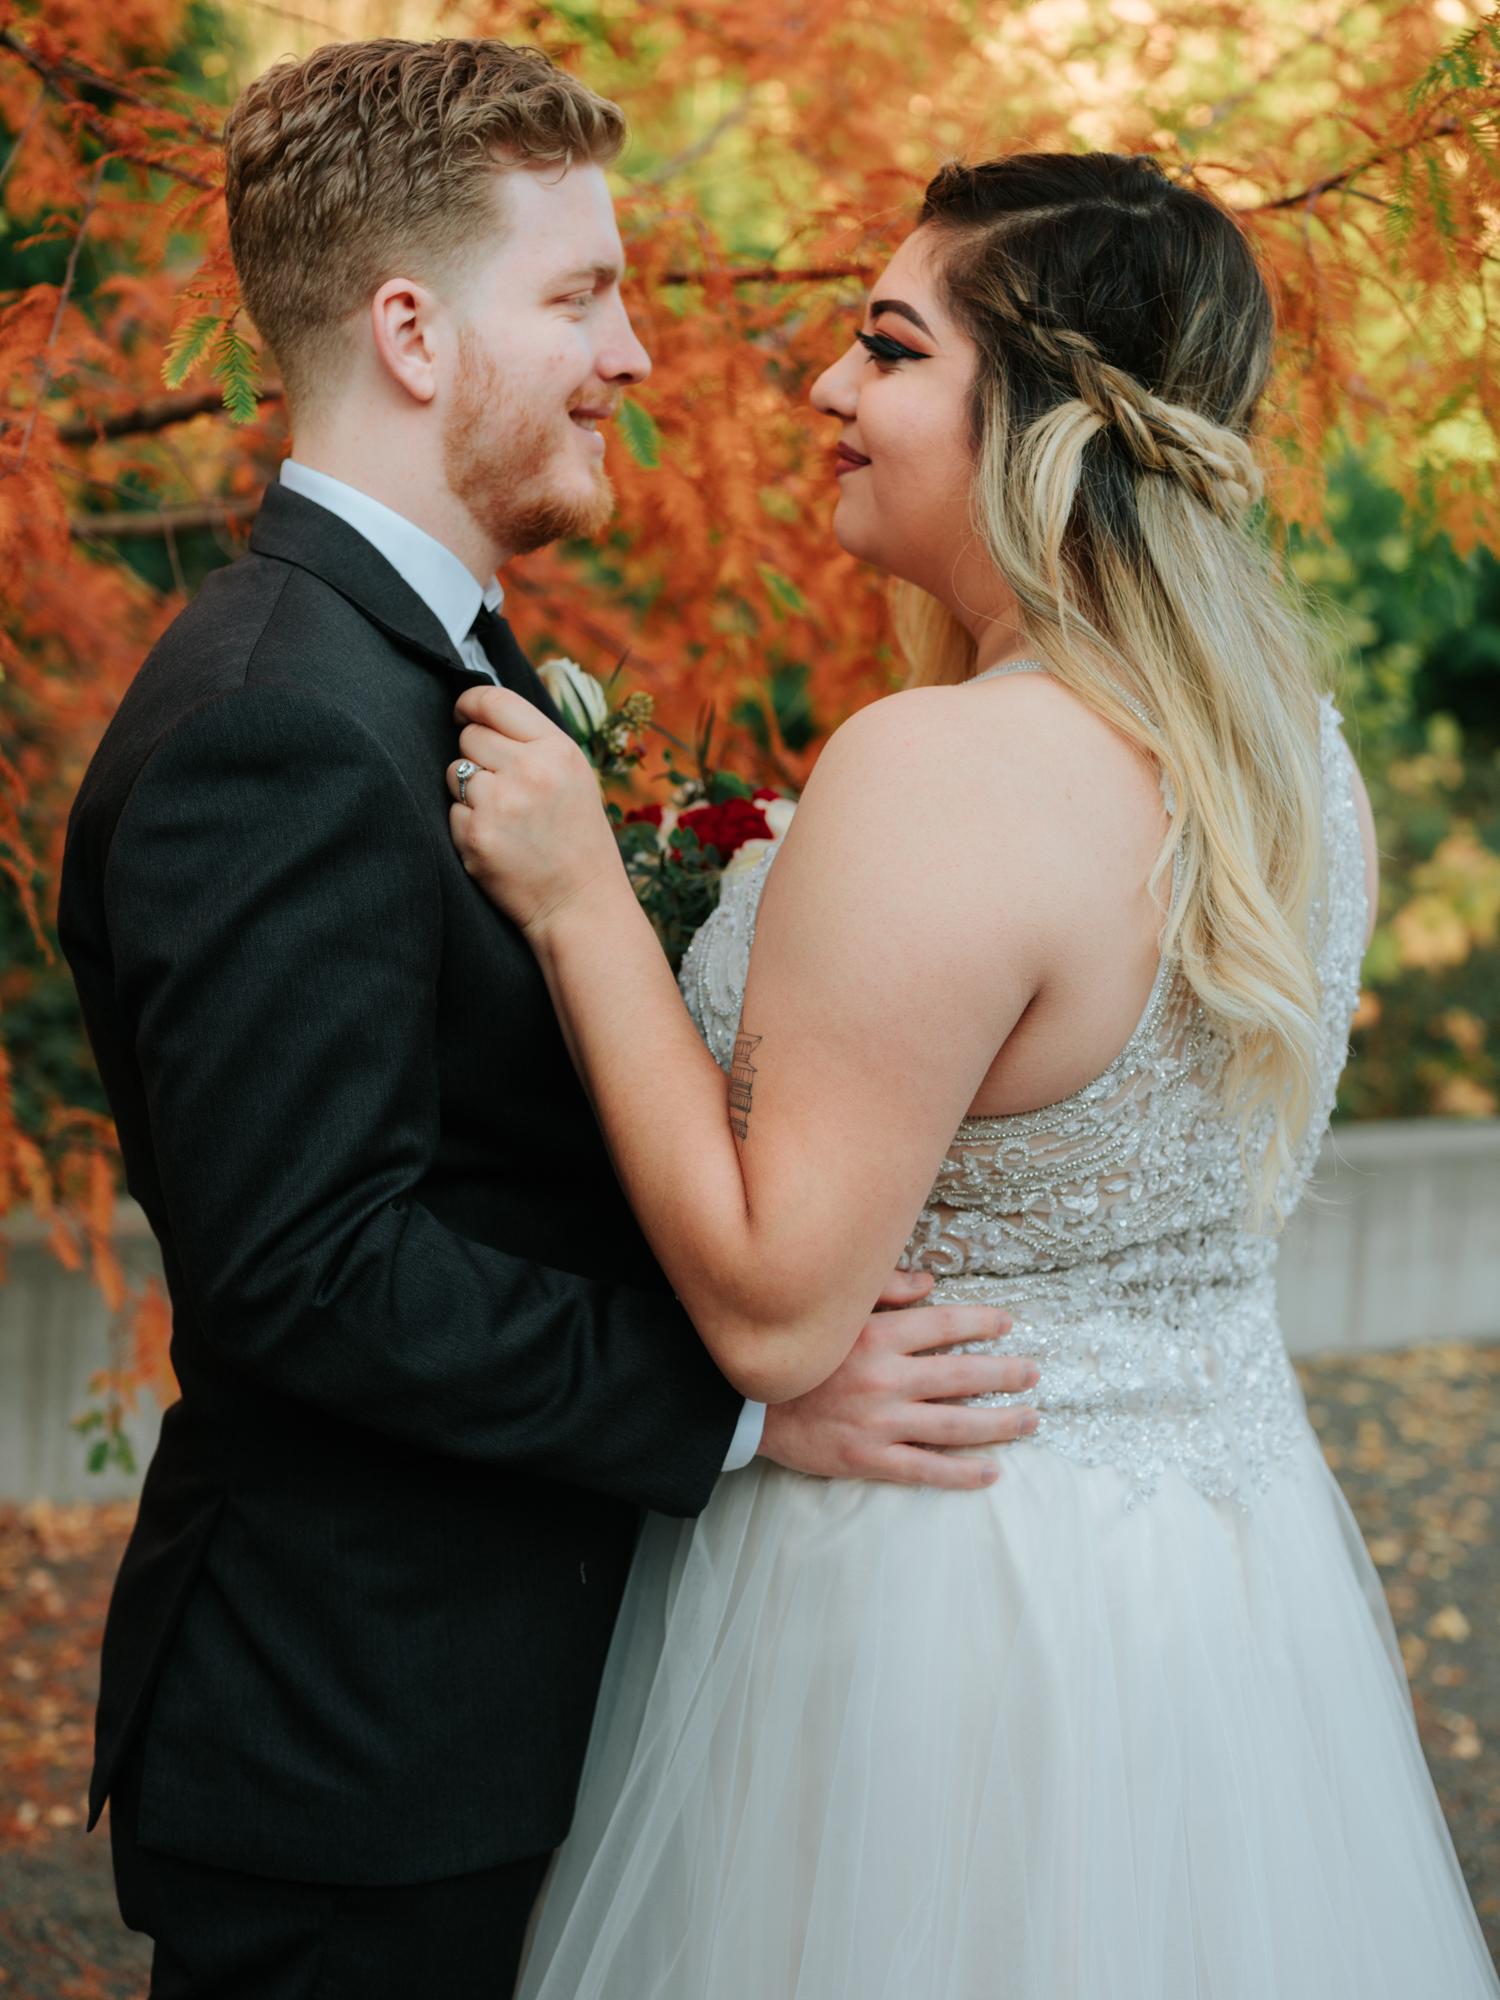 Stolen Glimpses Seattle Wedding Photographers 37.jpg